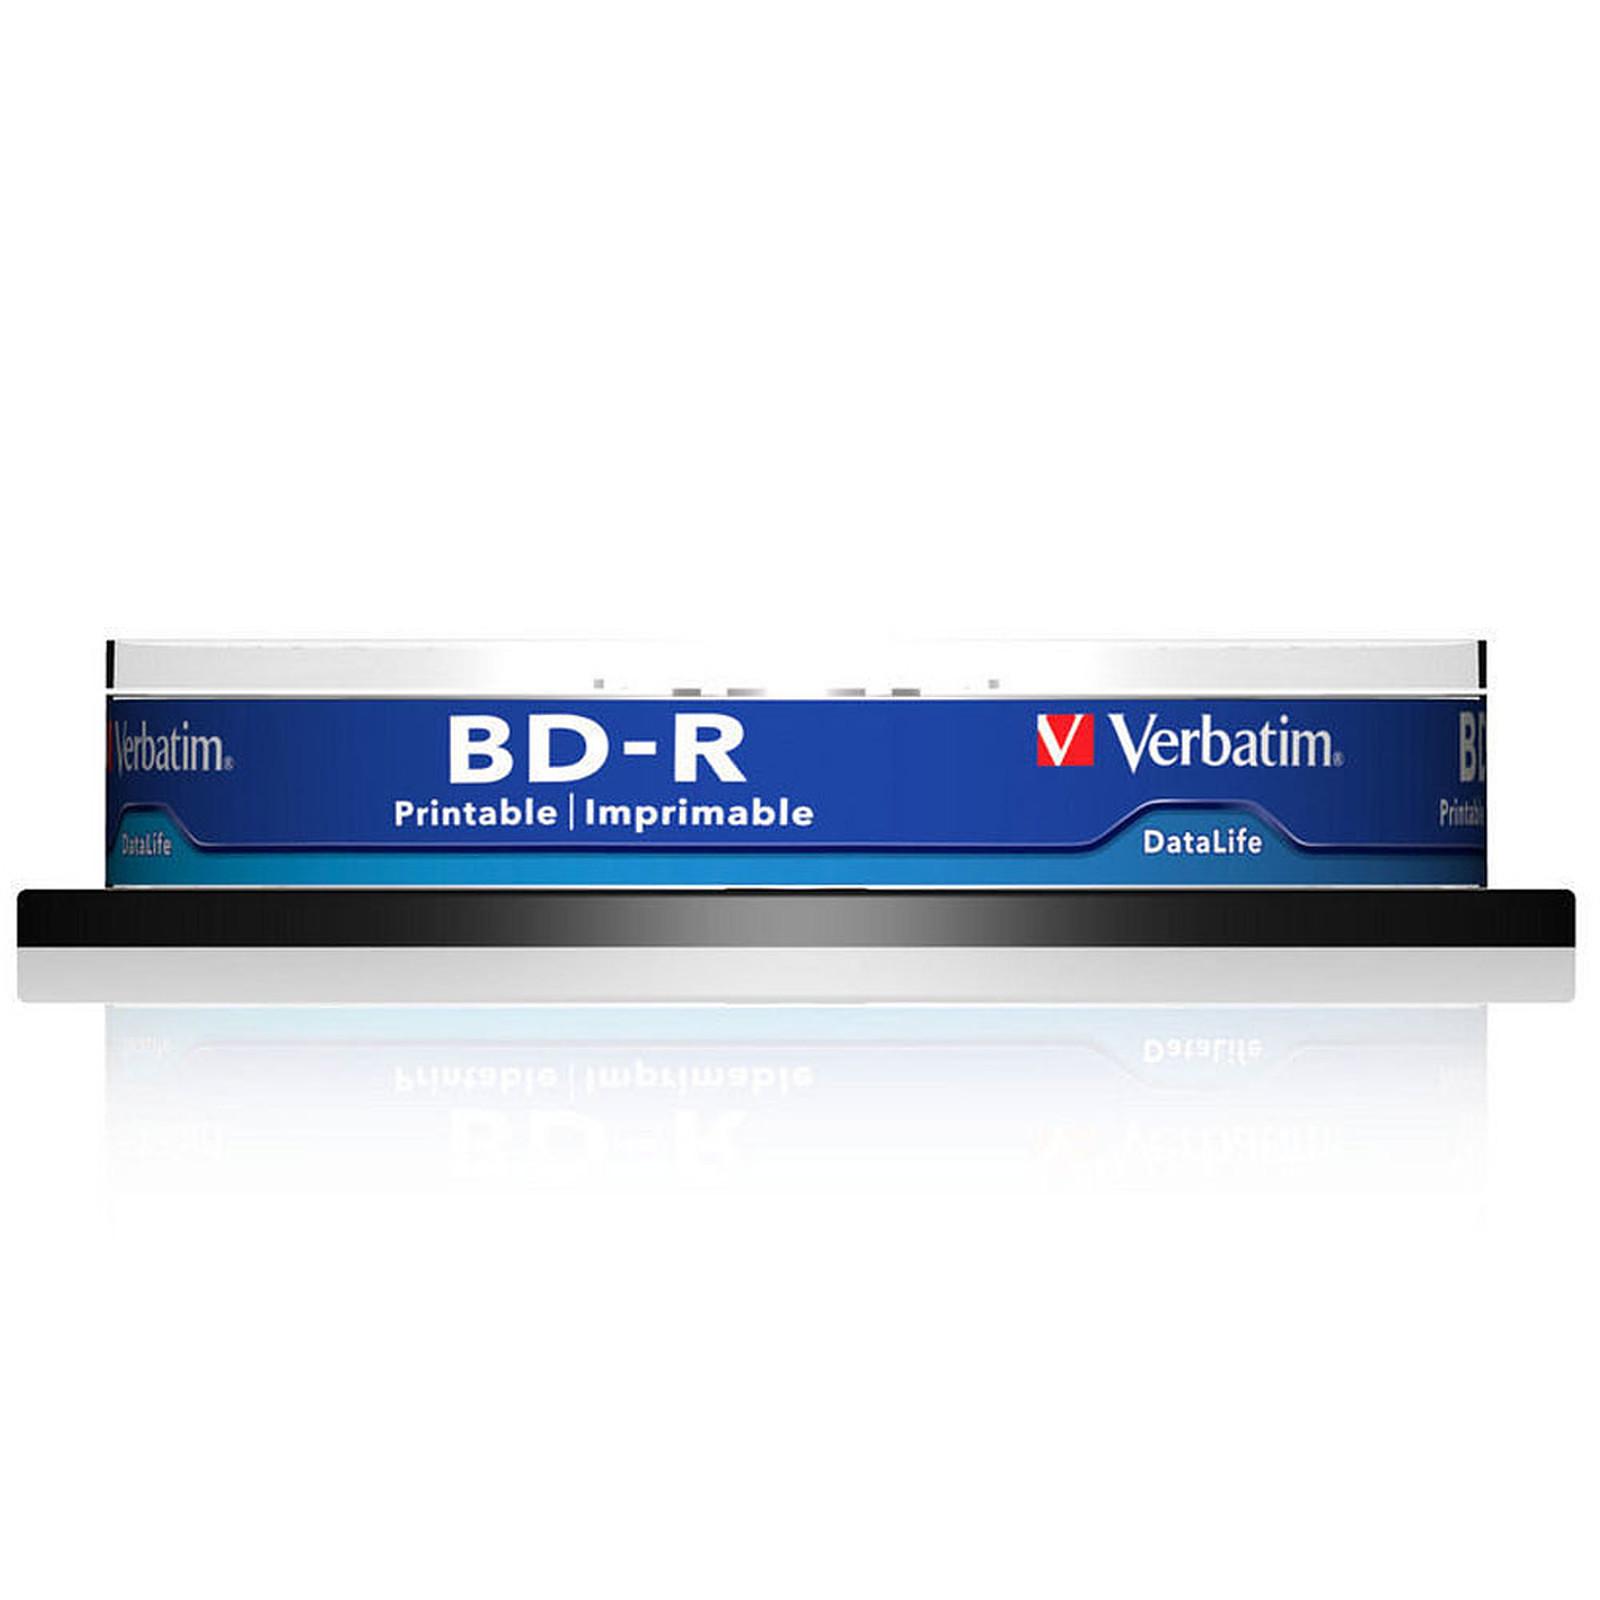 Verbatim BD-R SL 25 Go vitesse 6x imprimable (par 10, spindle)